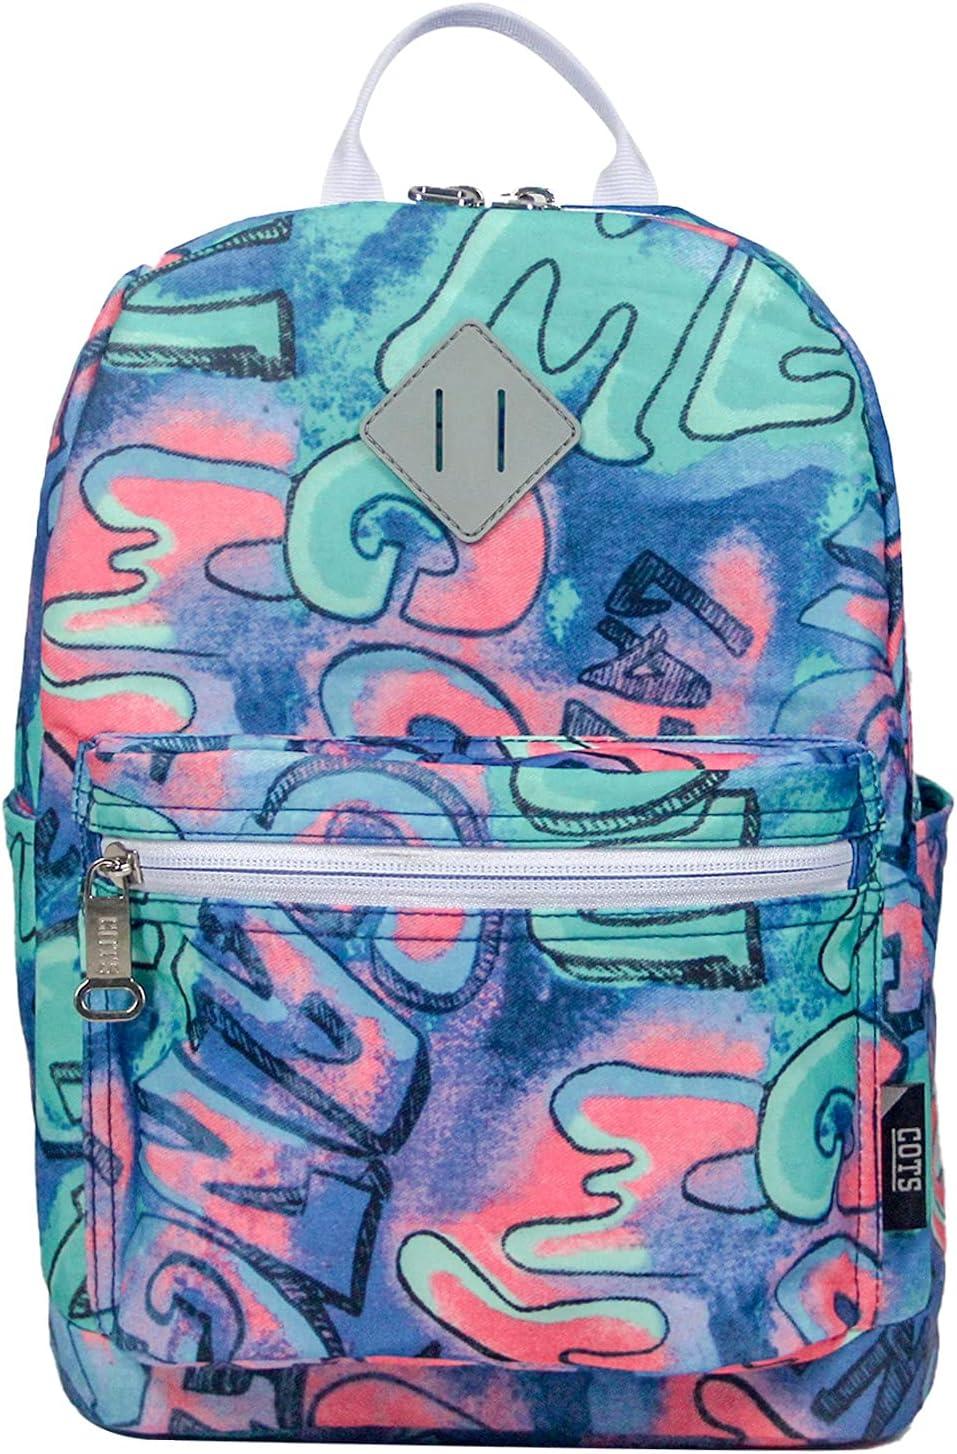 Backpack for Women Girls famous Basic Selling rankings Travel C Daypack Water Resistant